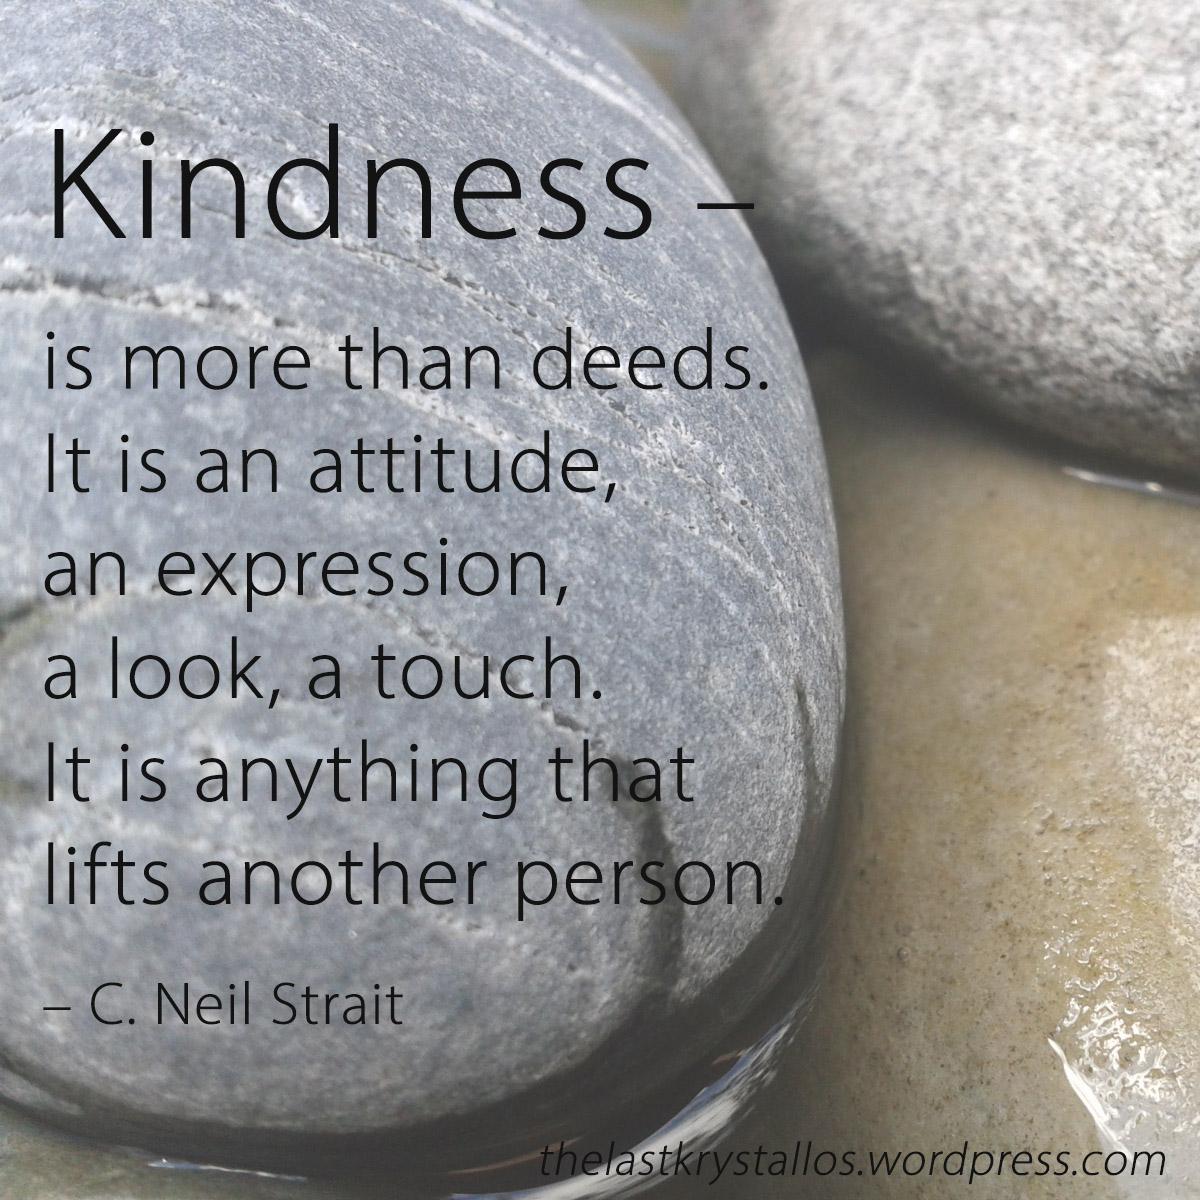 Kindness-is-more-than-C-Neil-Strait-the-last-krystallos